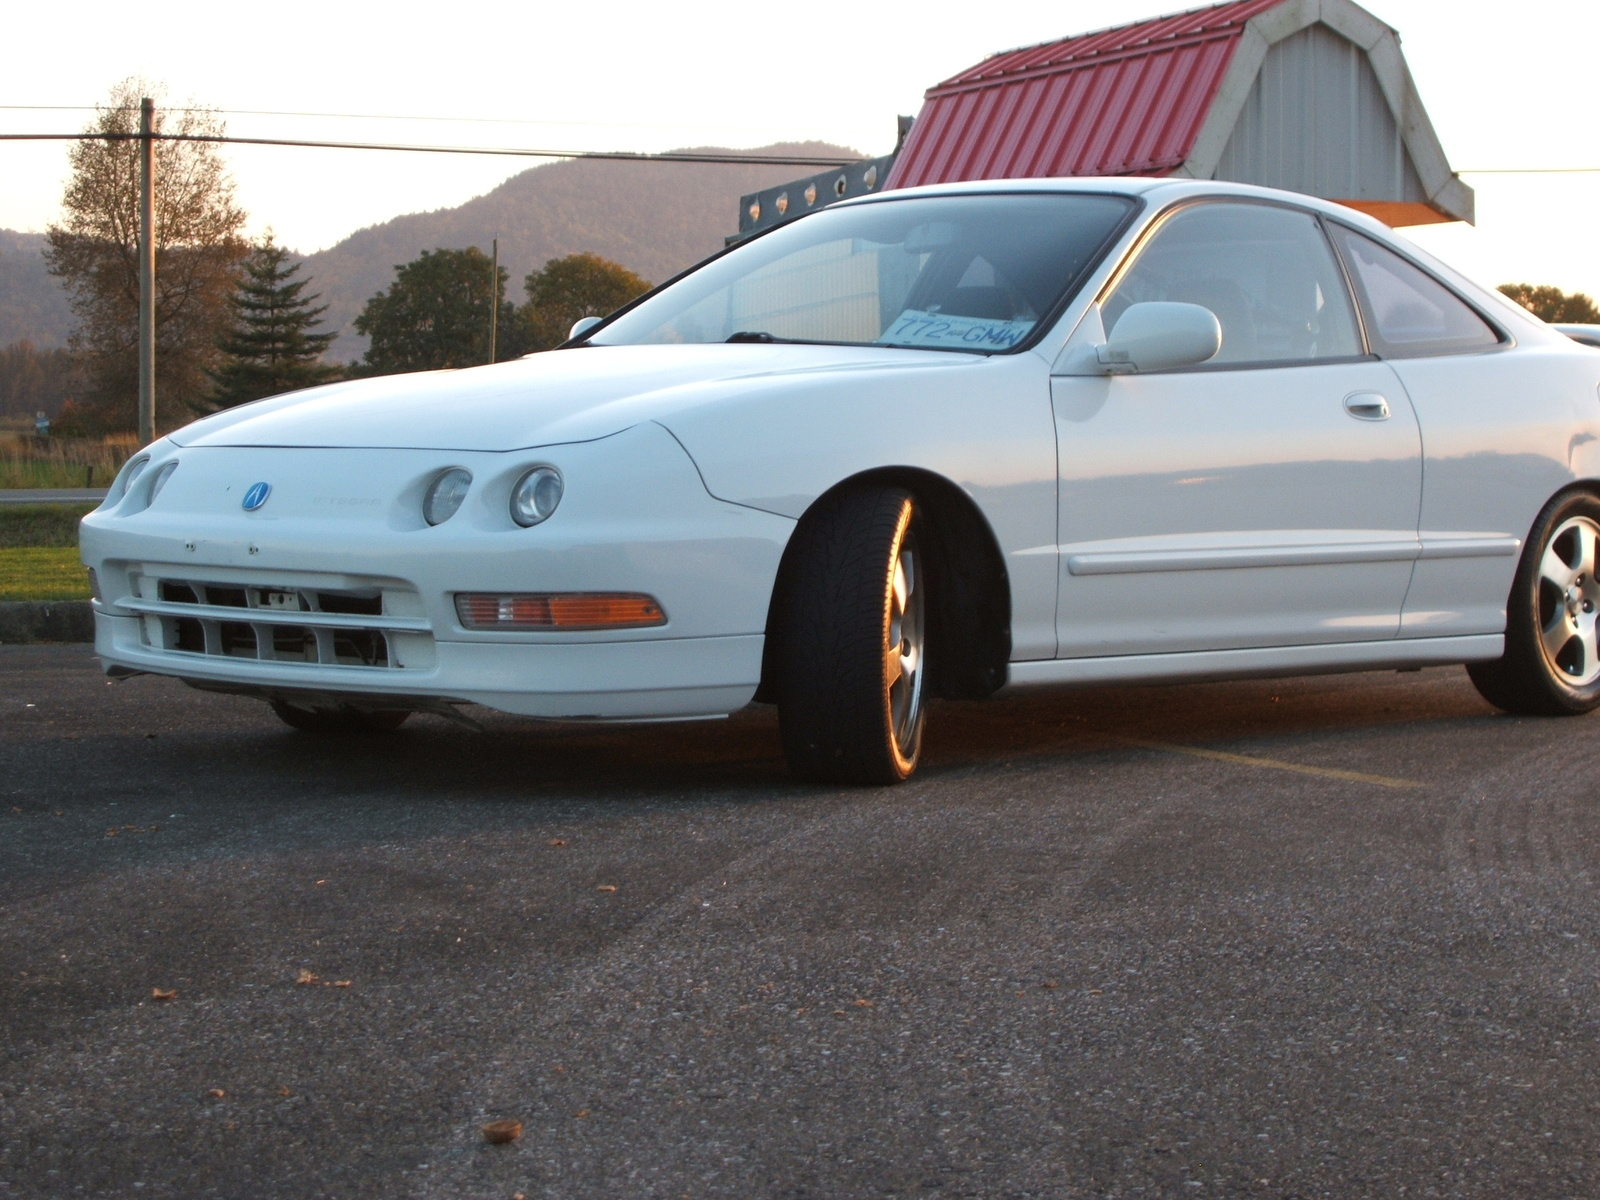 1995 Acura Integra - Partsopen